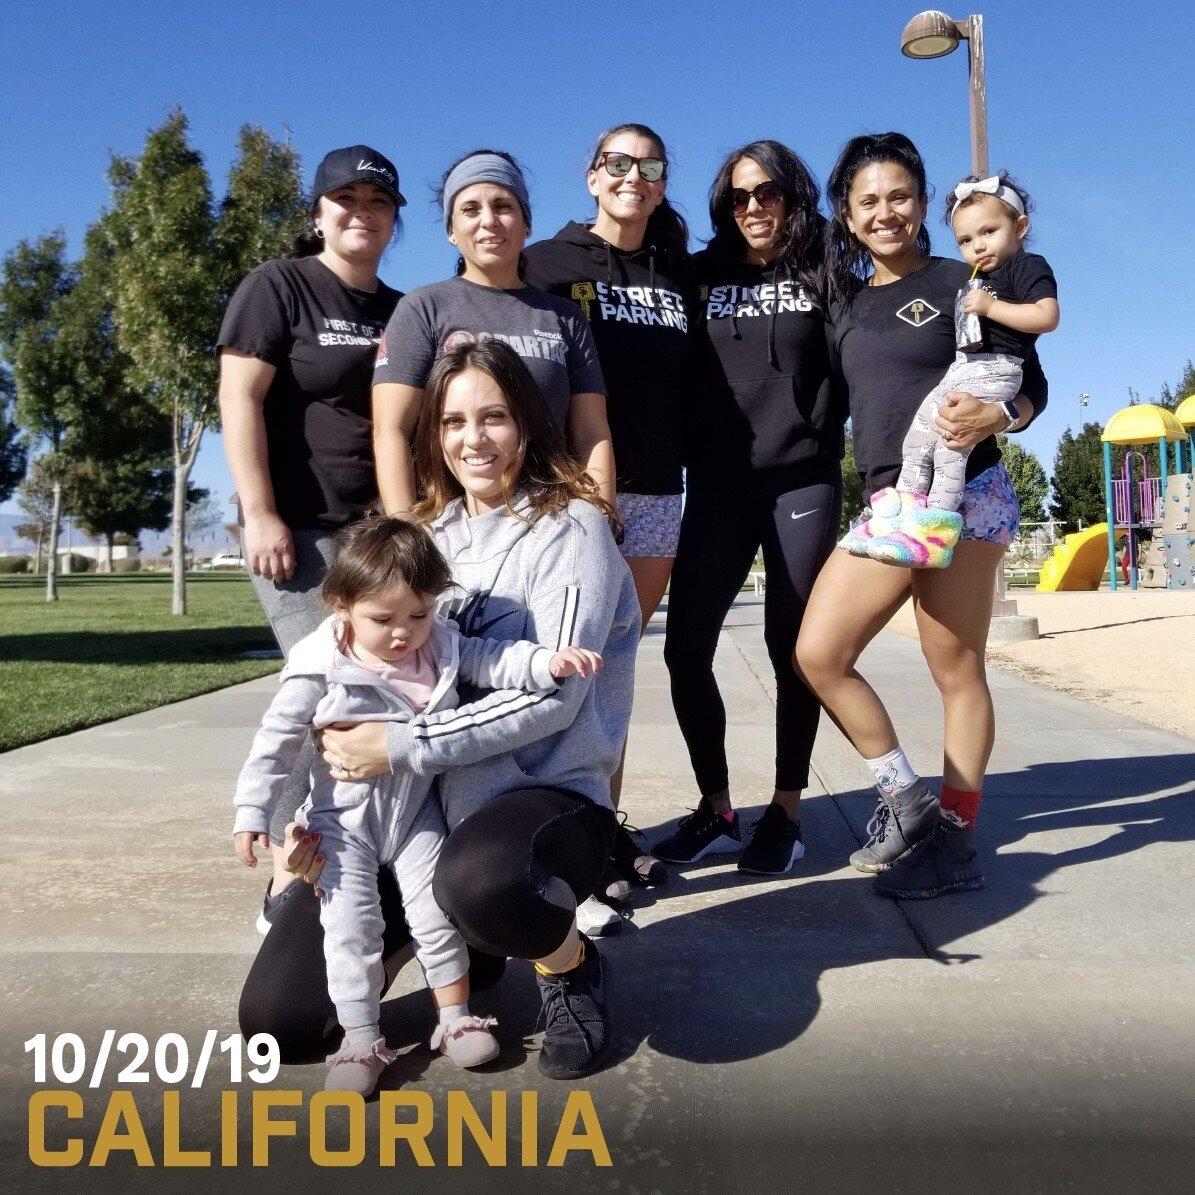 Oct 20, 2019 | Cali